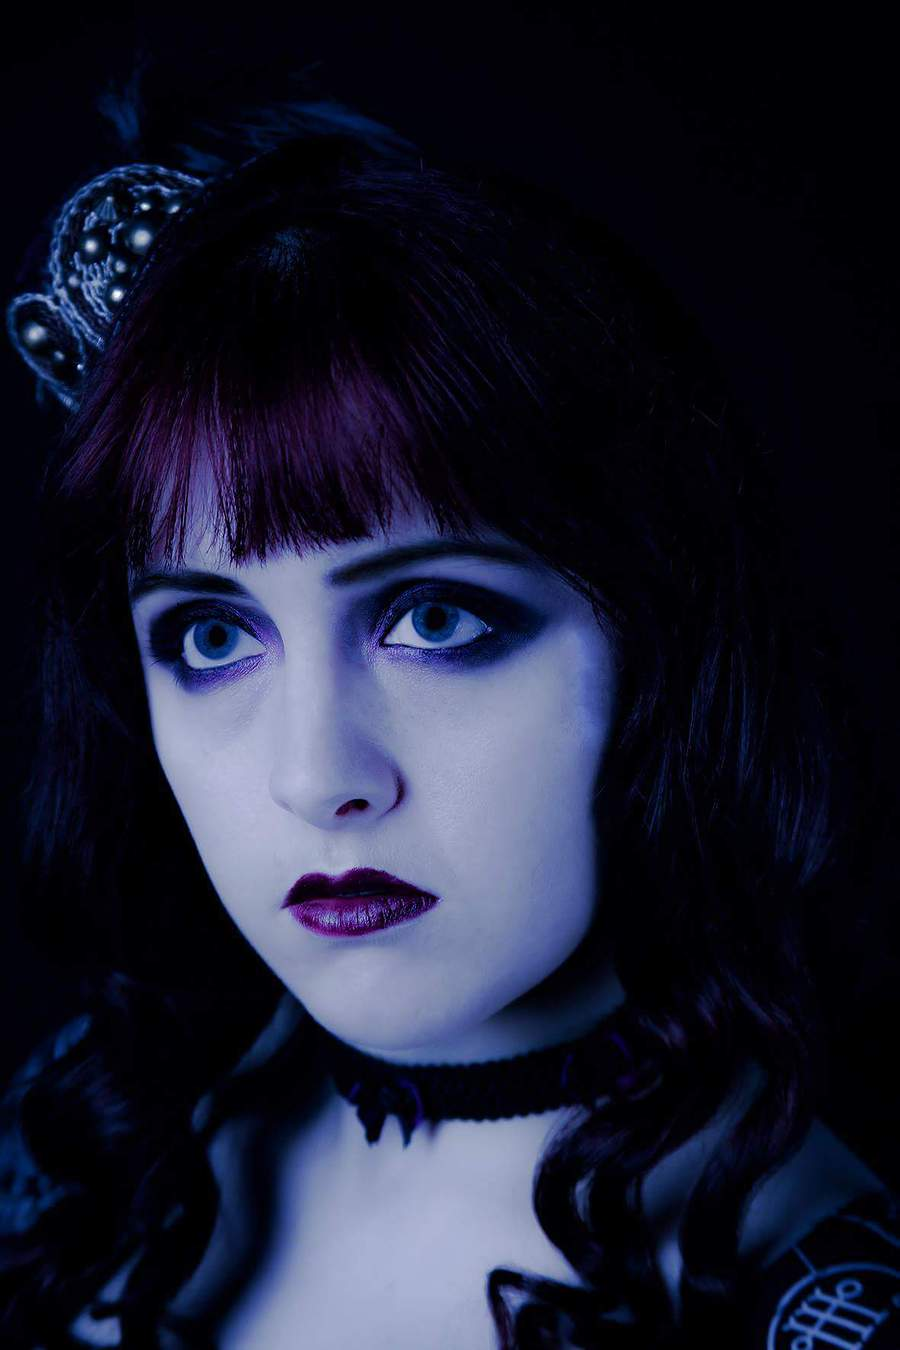 Gothic portrait / Model Maretta Vergette / Uploaded 20th April 2017 @ 04:03 PM